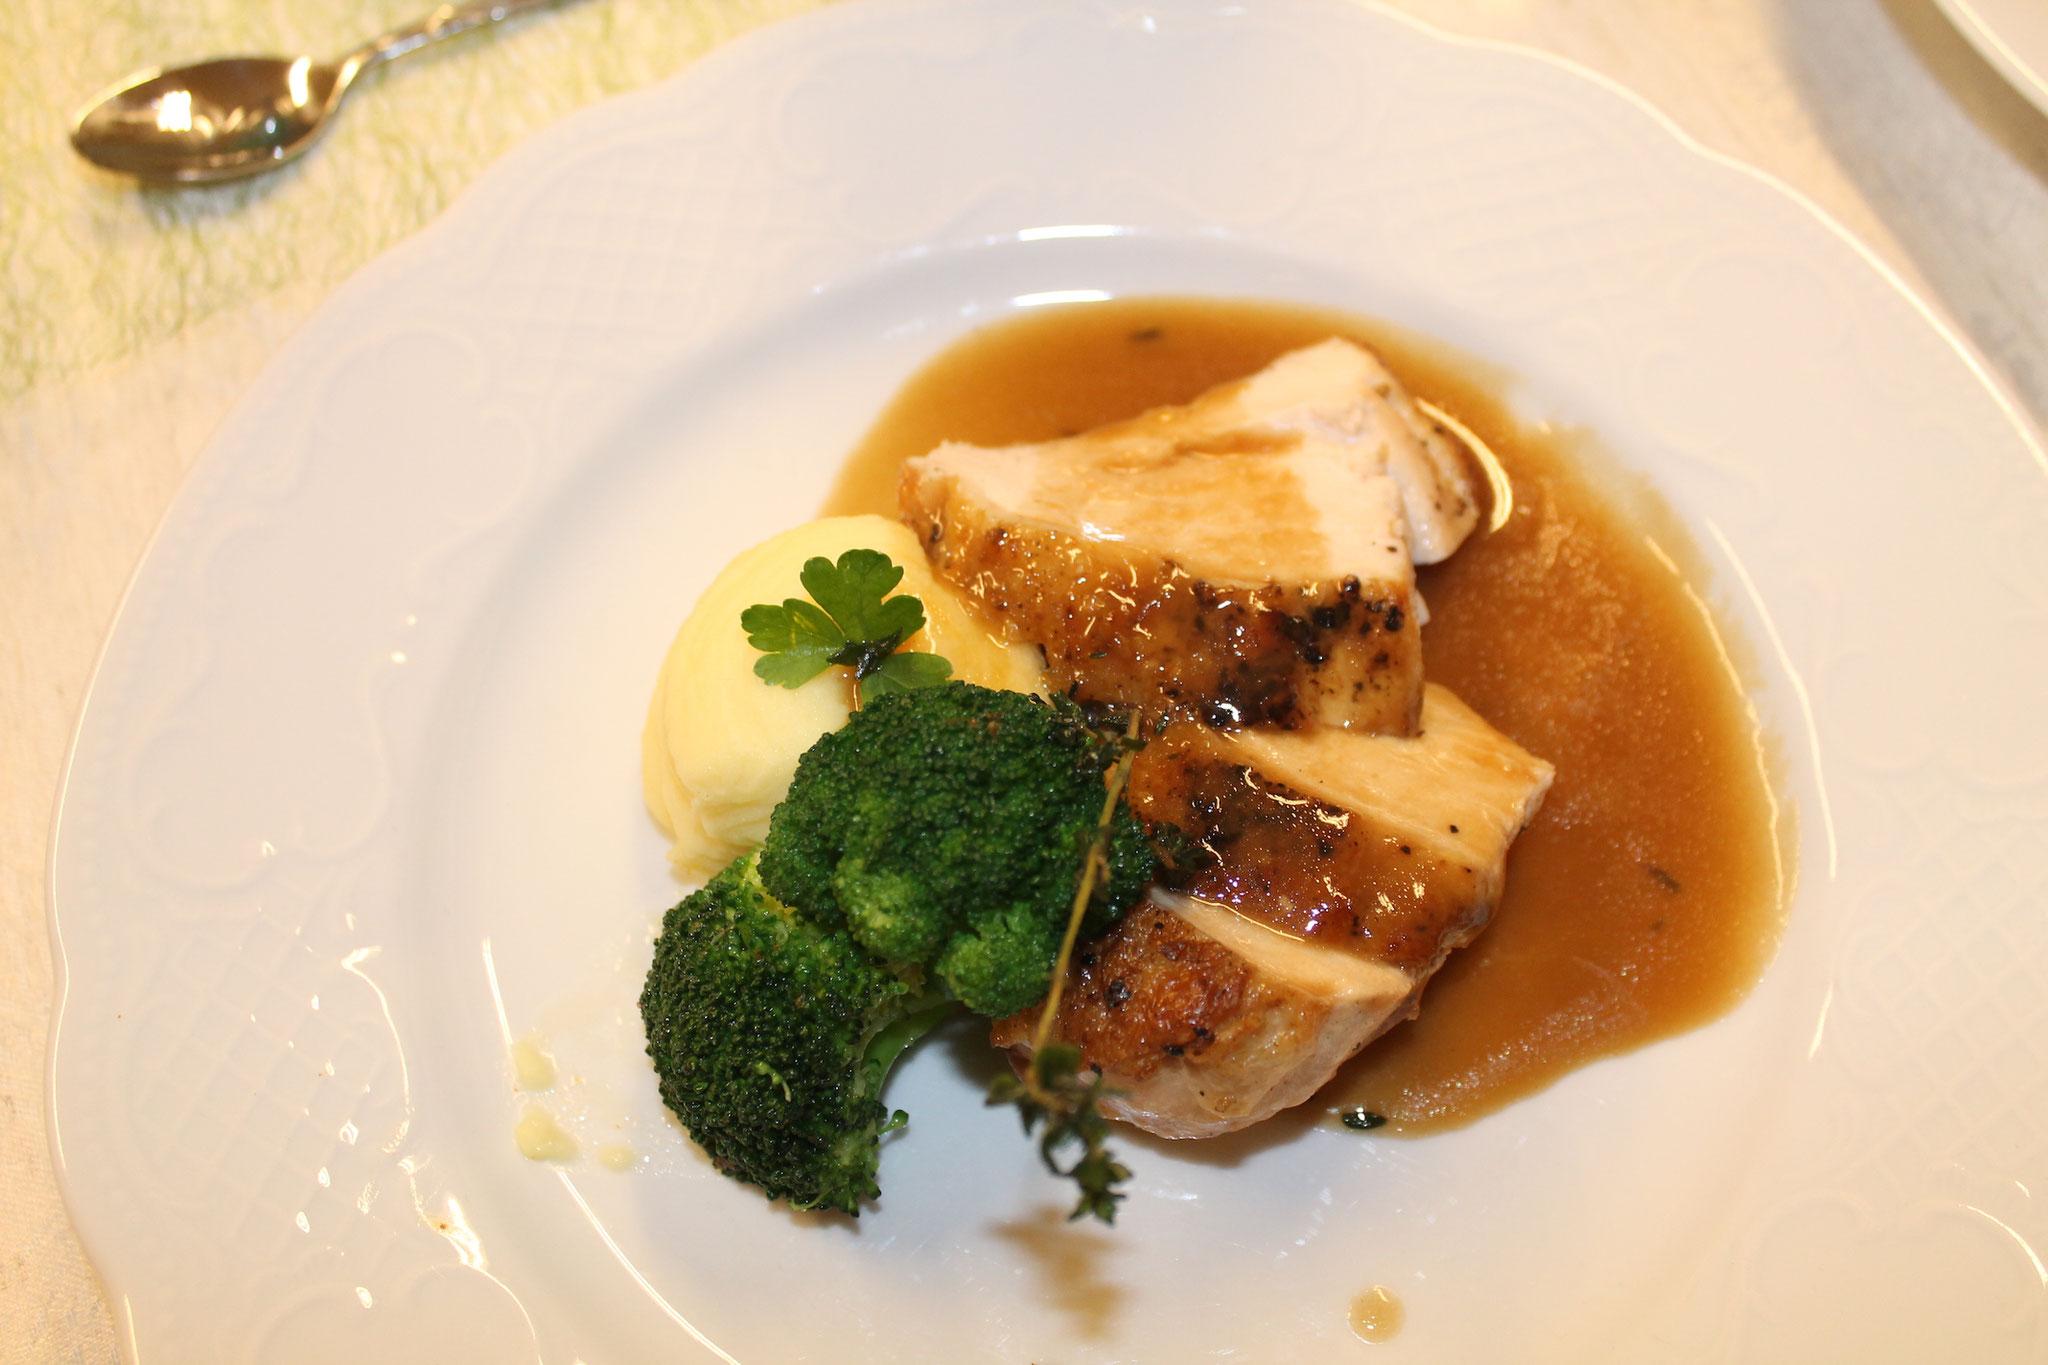 Gebratene Hähnchenbrust mit Wurzel-Kräuteraroma, Kartoffelpüree und Broccoli